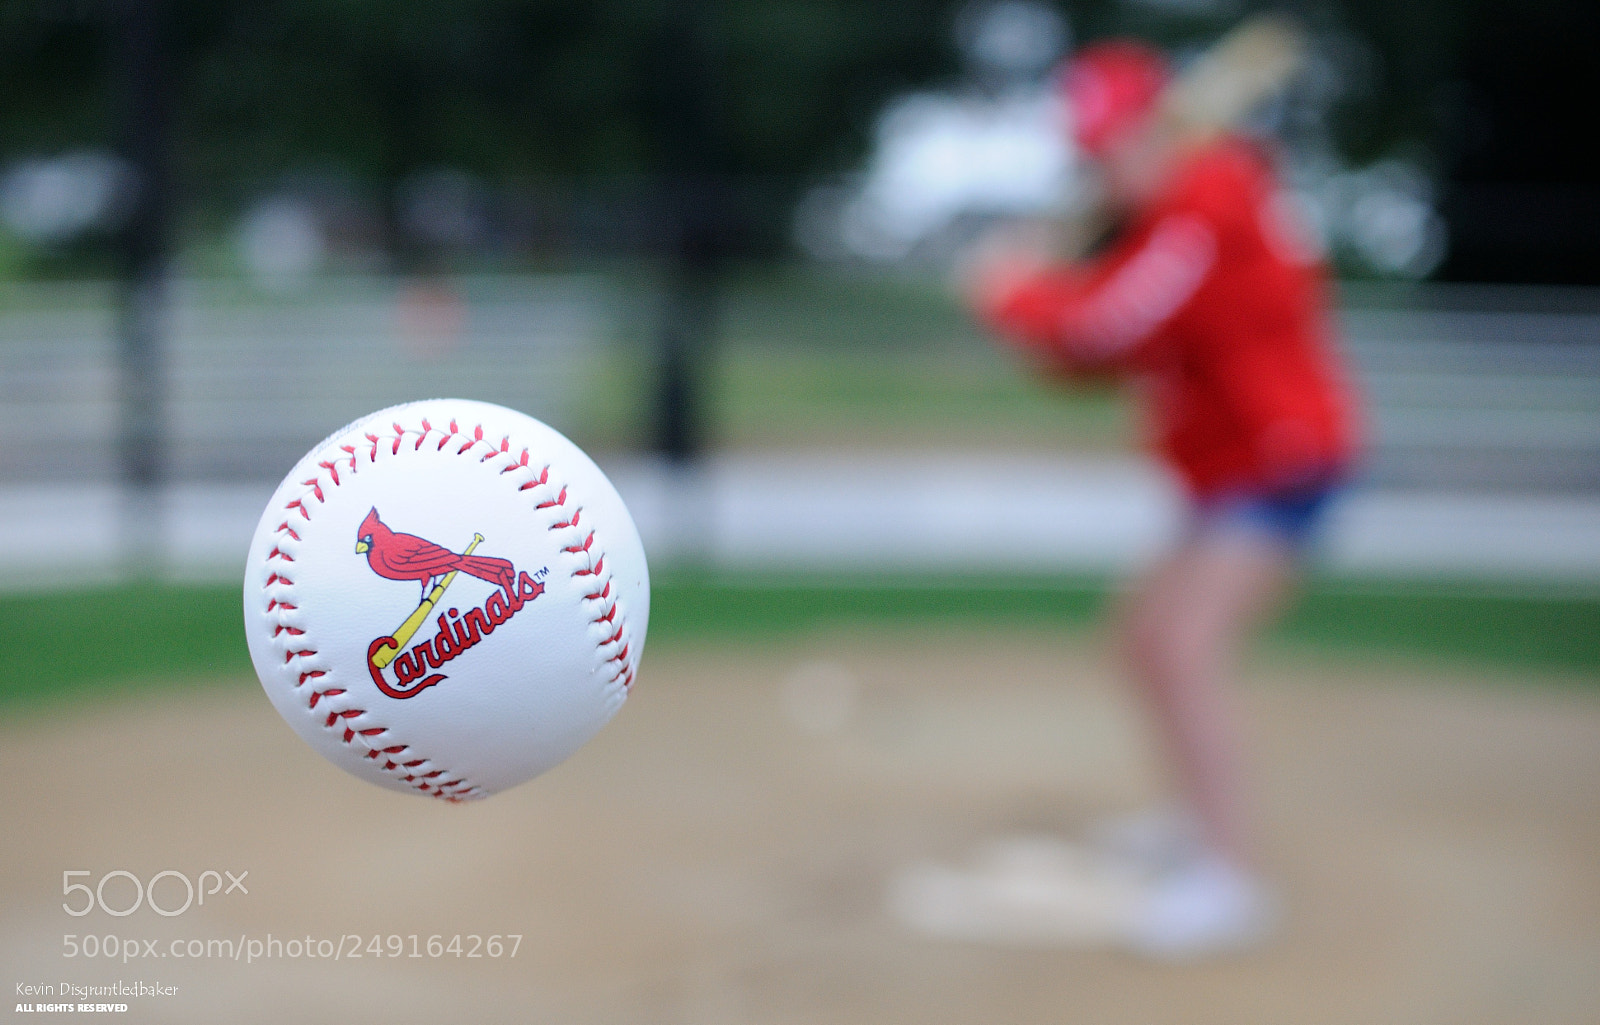 Cardinals Baseball, Nikon D90, Sigma 30mm F1.4 EX DC HSM